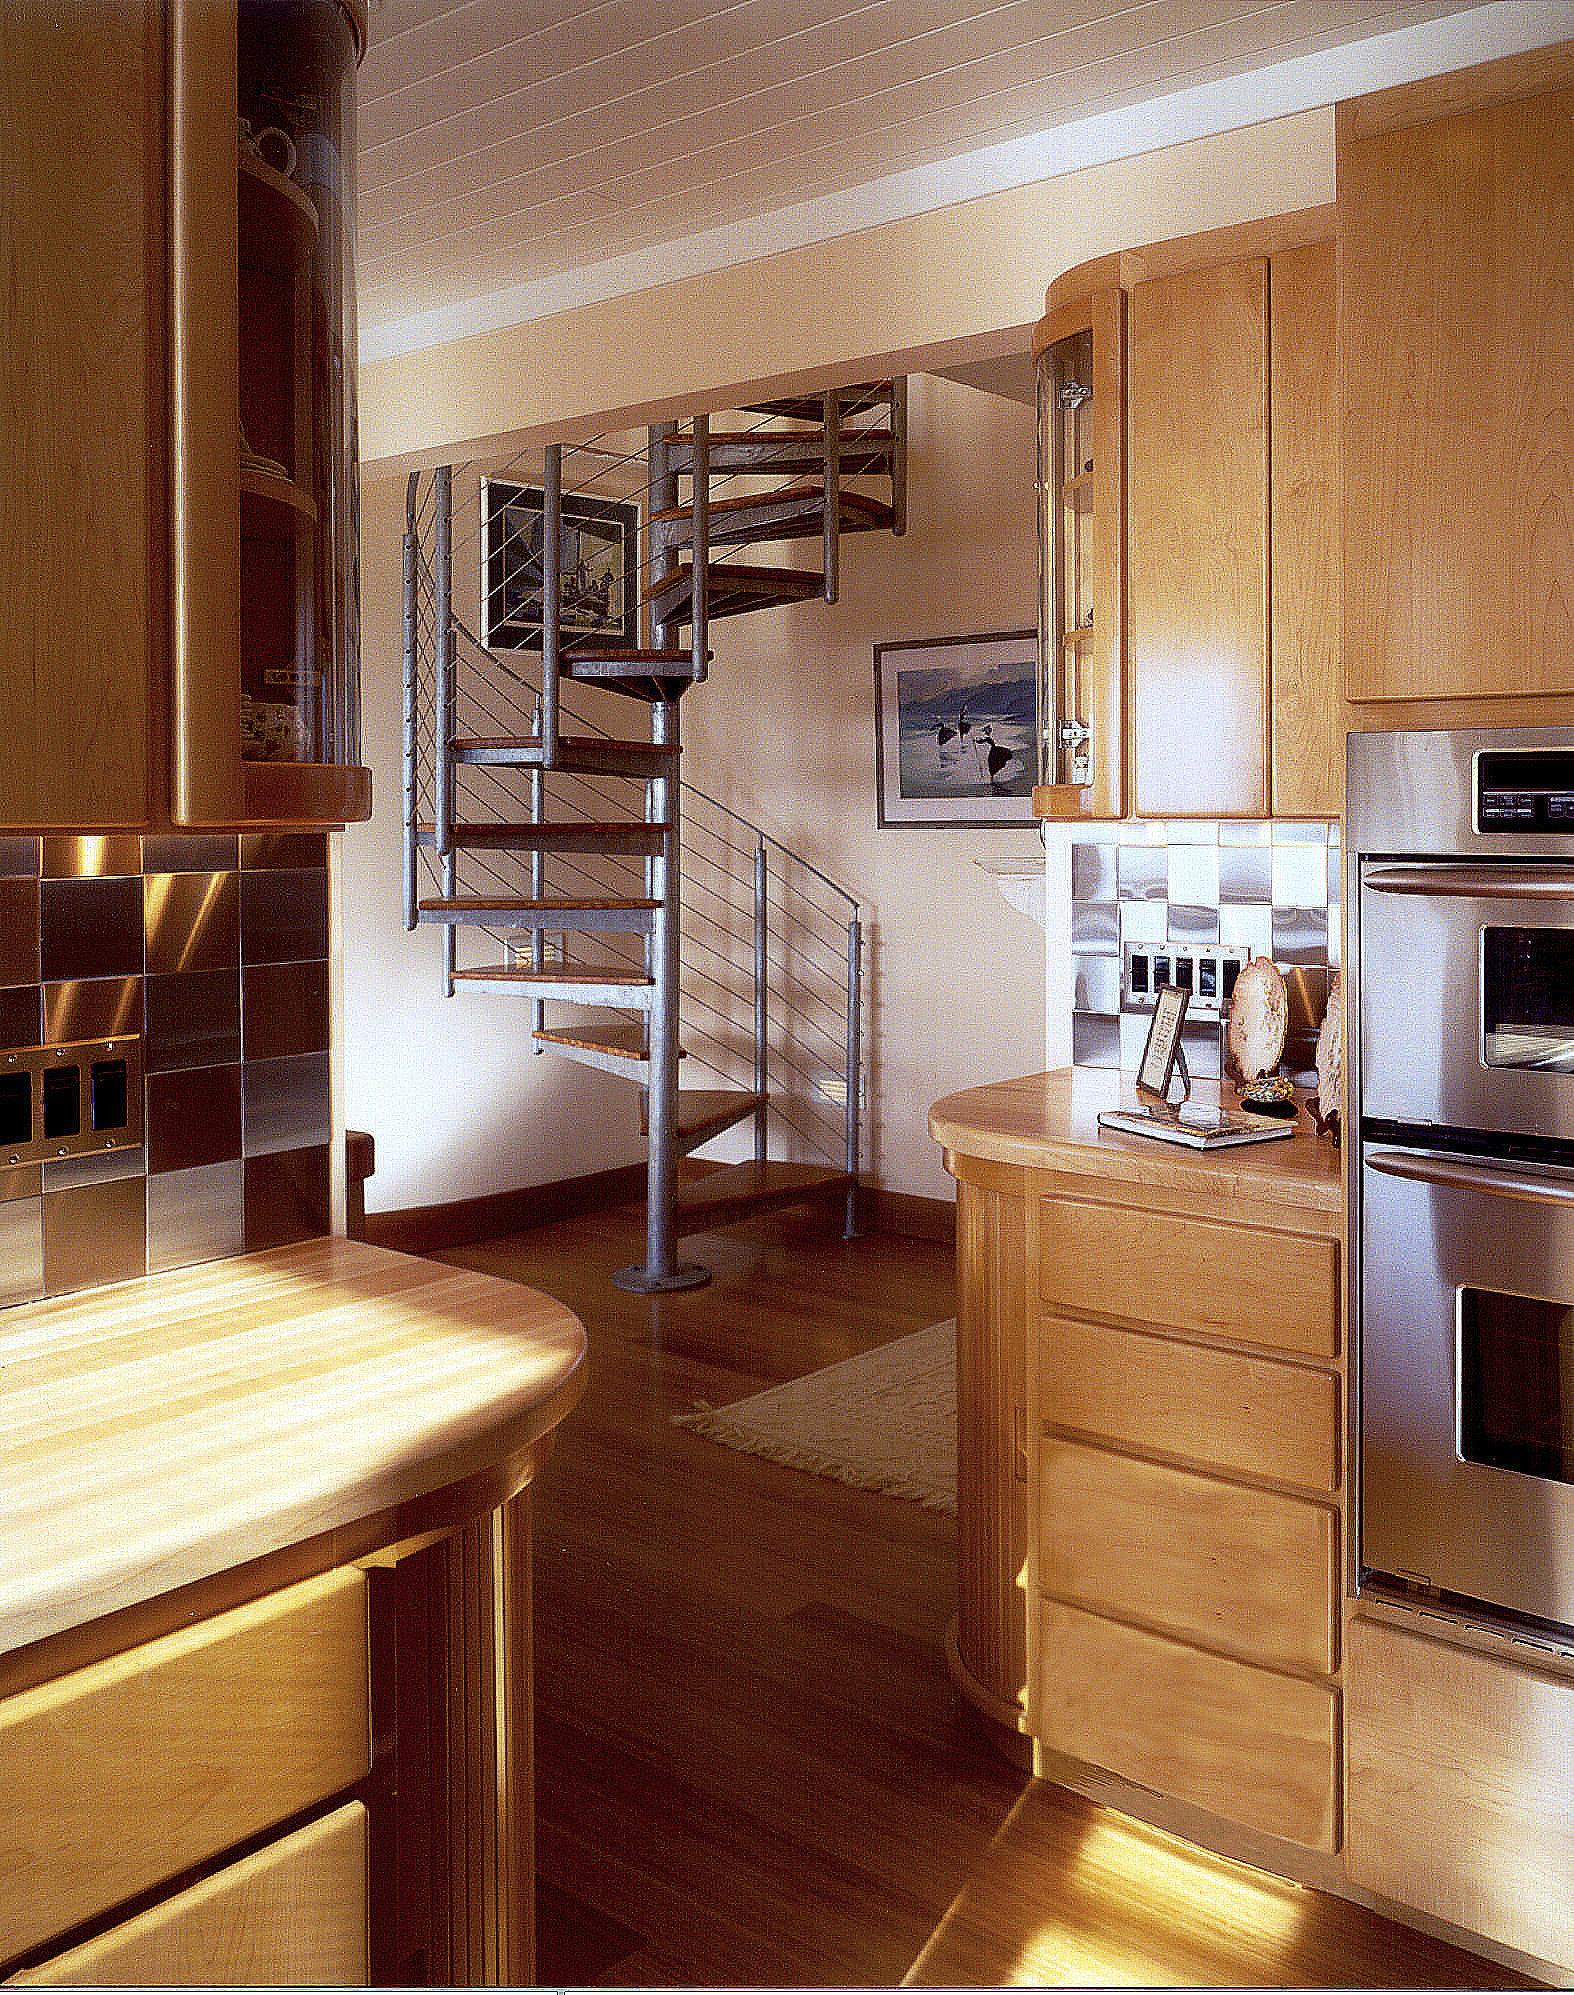 6Spiral stair.jpg